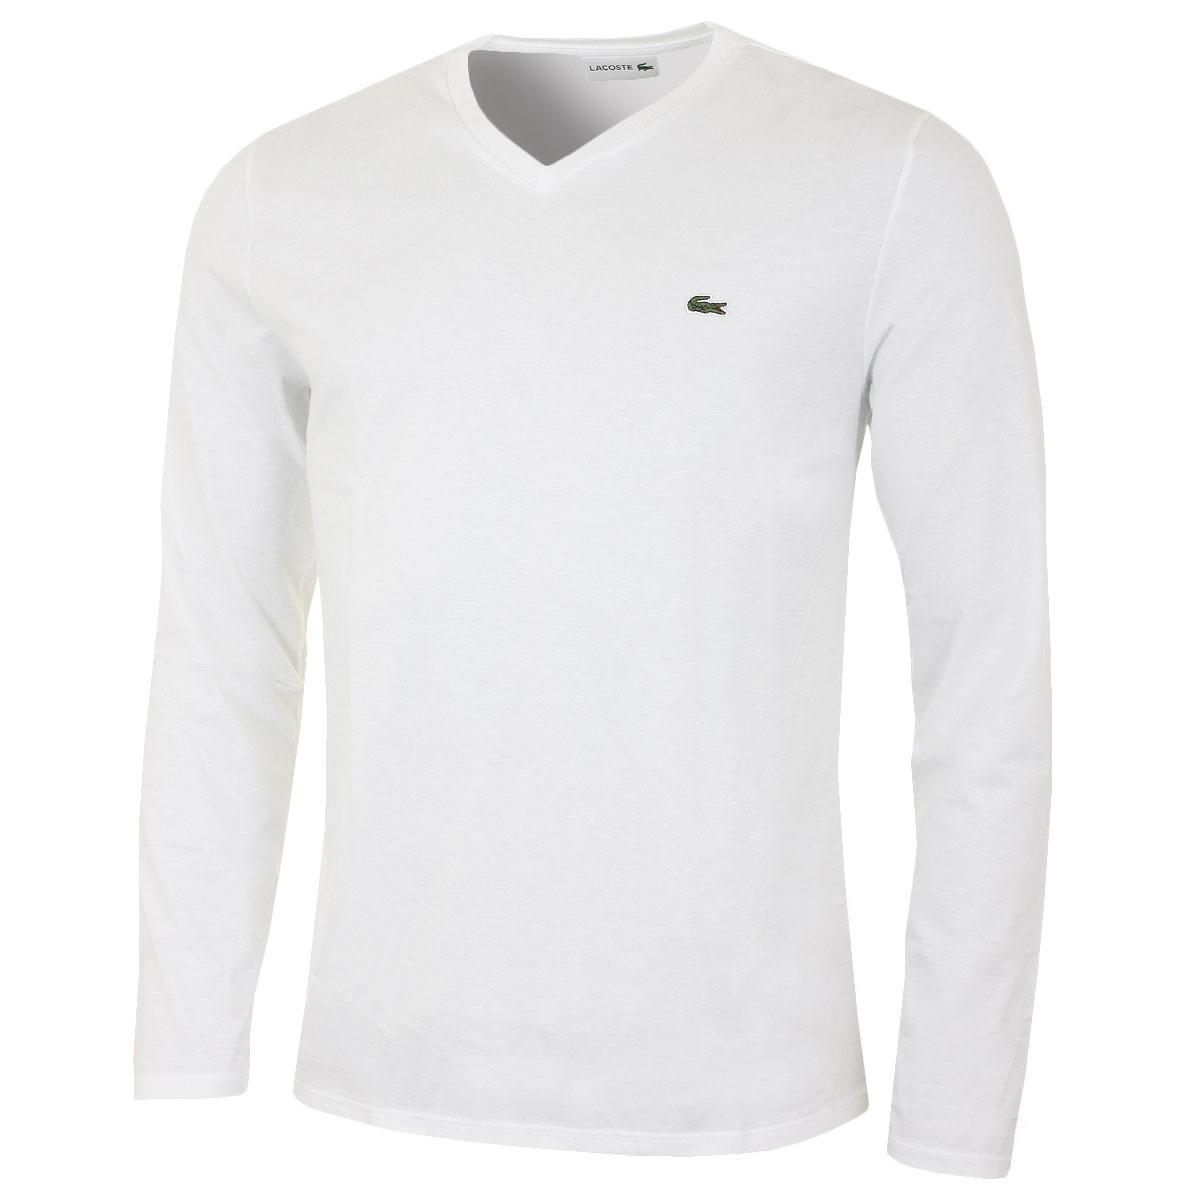 Lacoste 2017 mens th6711 long sleeve v neck tee t shirt ebay for Long sleeve v neck t shirt mens